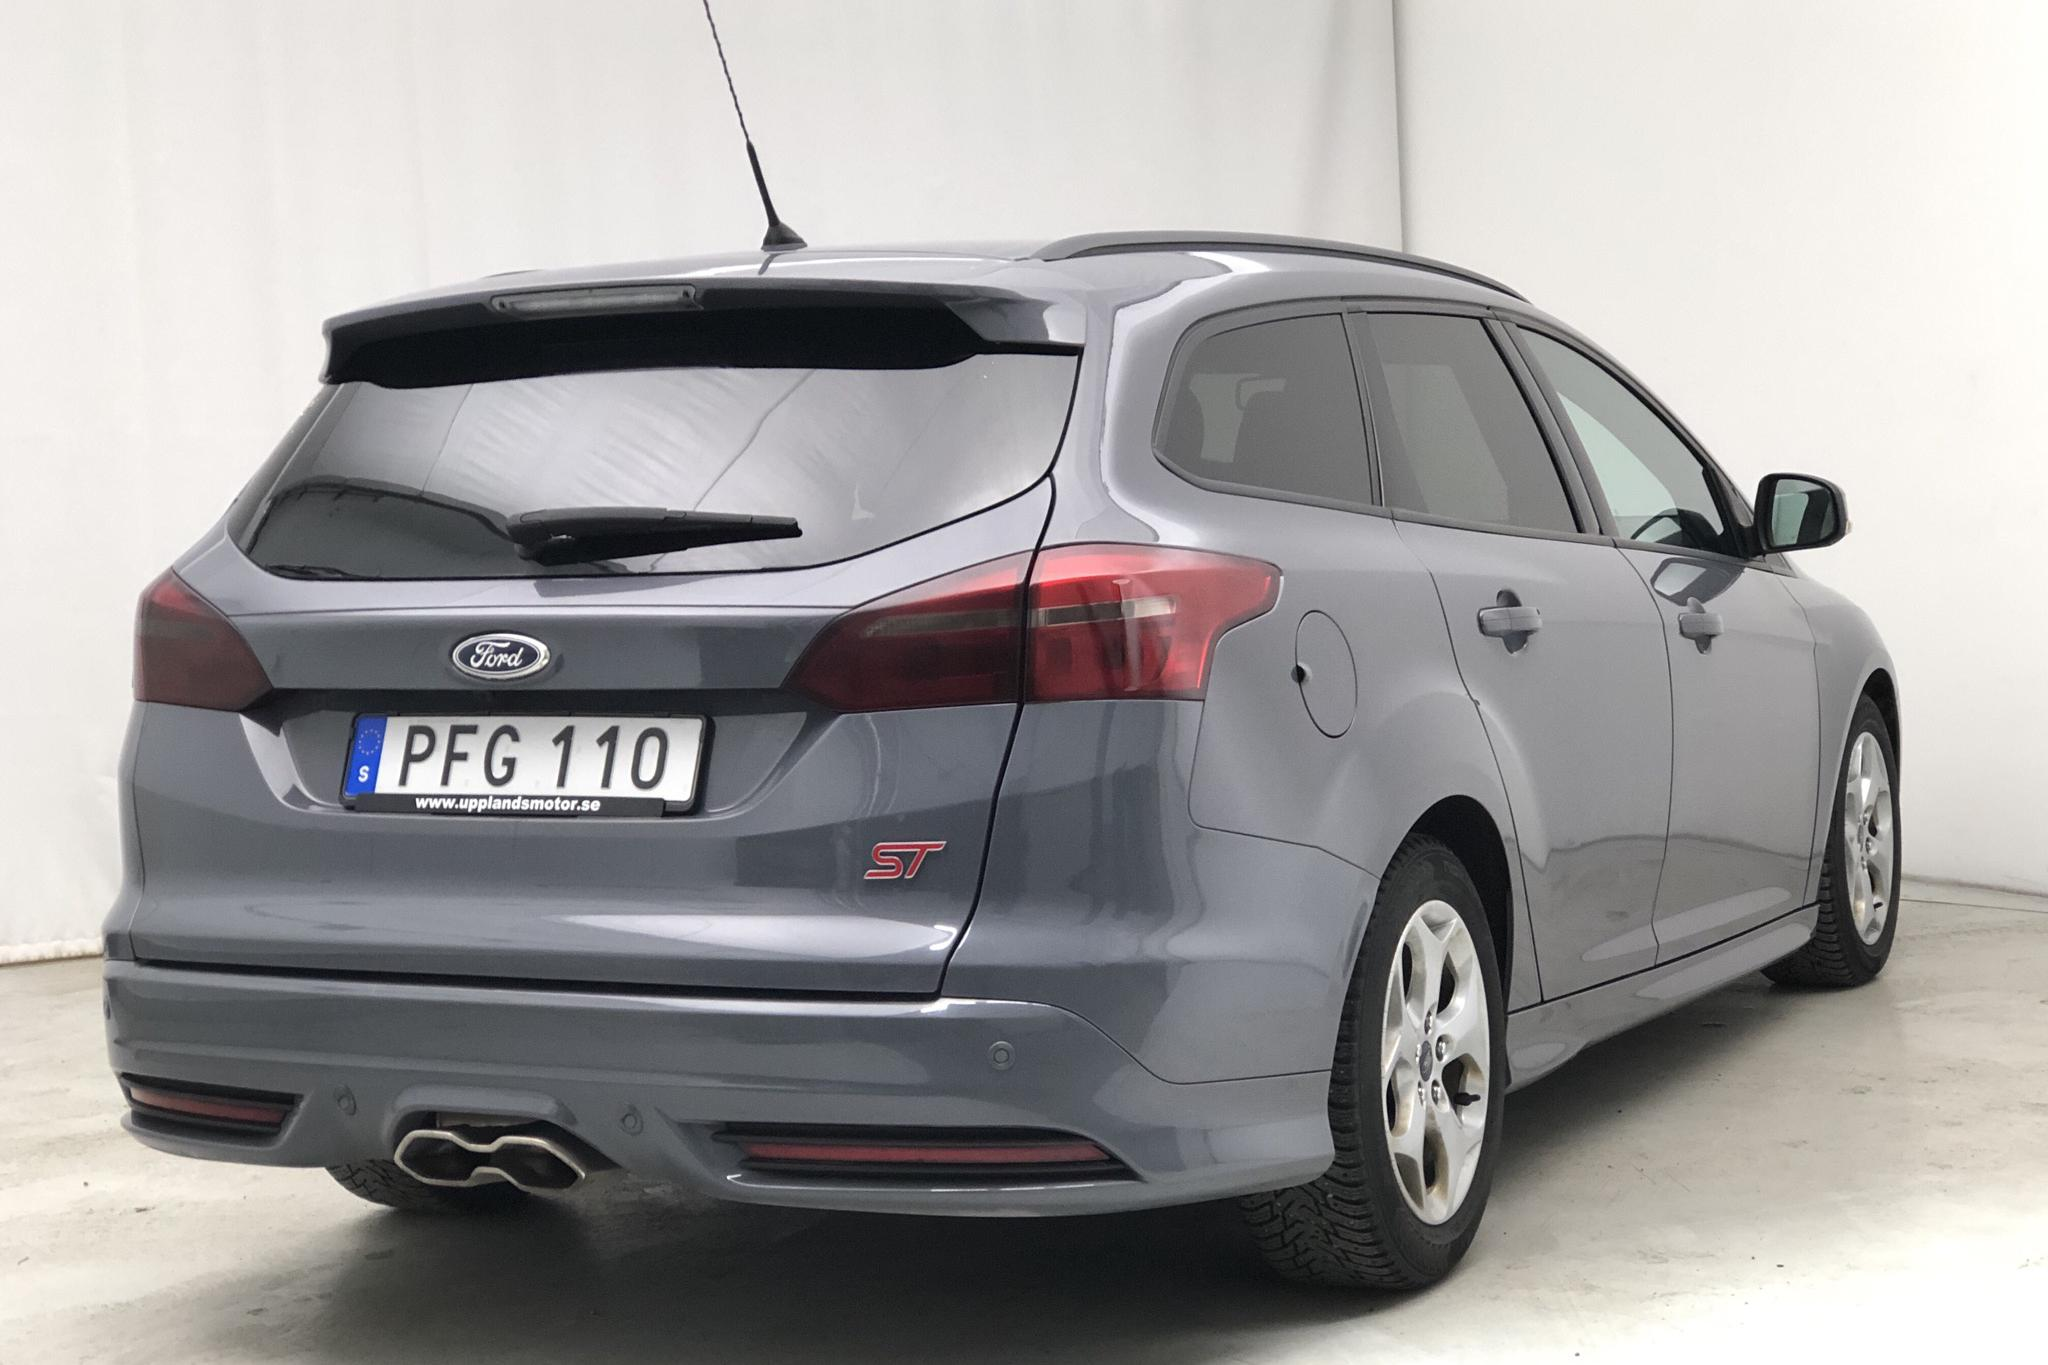 Ford Focus 2.0 TDCi Kombi (180hk) - 40 310 km - Automatic - gray - 2017